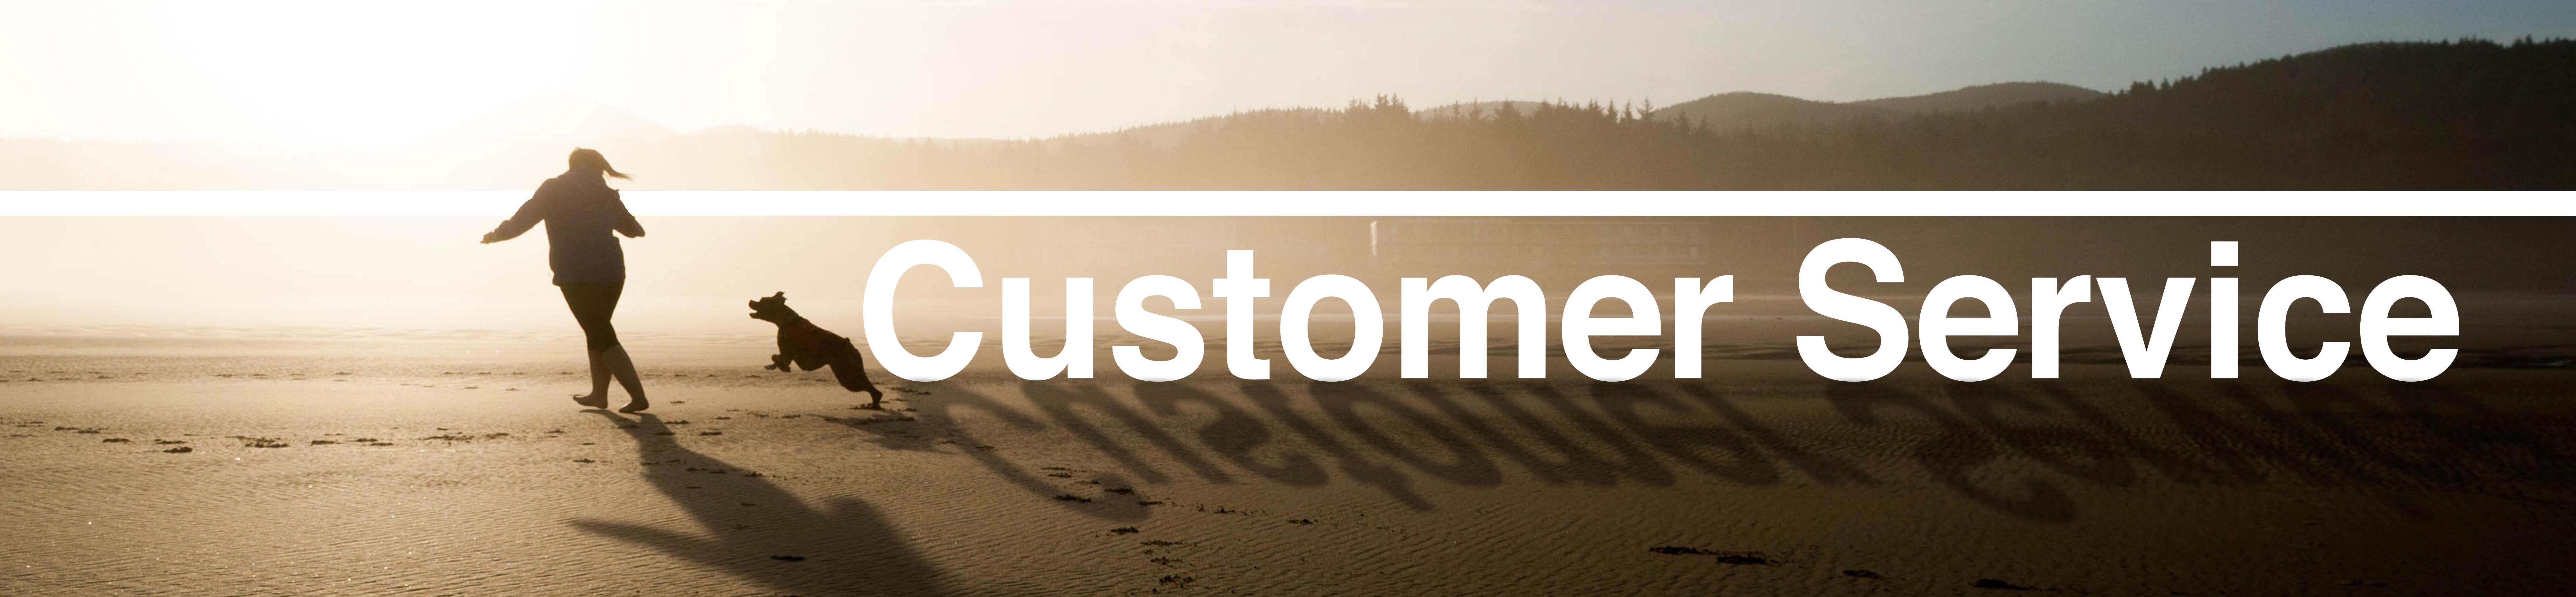 customer-service-2.jpg